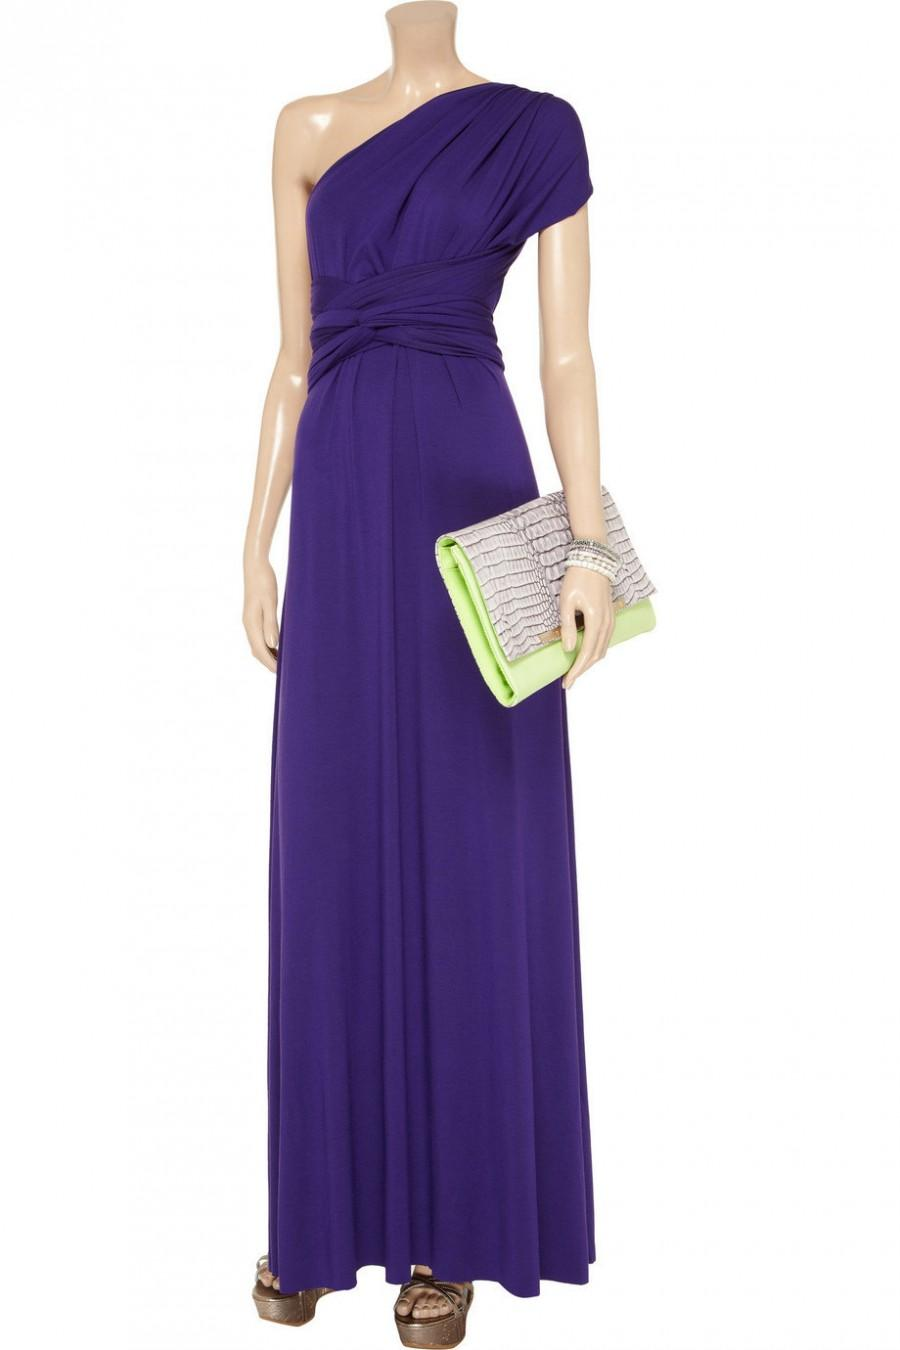 Purple Custom Handmade Infinit Dress.Wrapping Convertible ...